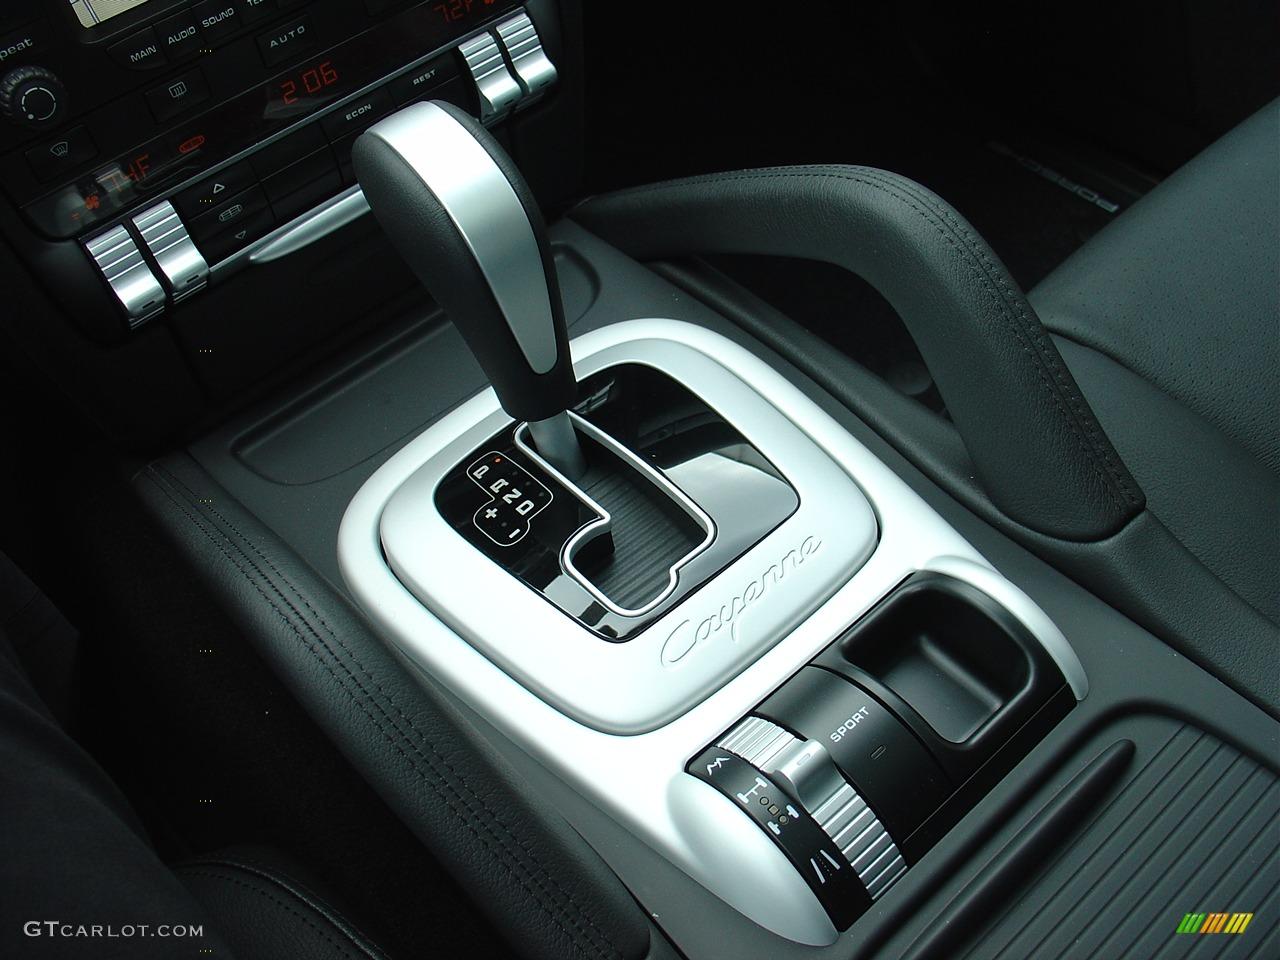 2008 Porsche Cayenne S Cayenne Tiptronic Gear Selector Photo 25137 Gtcarlot Com